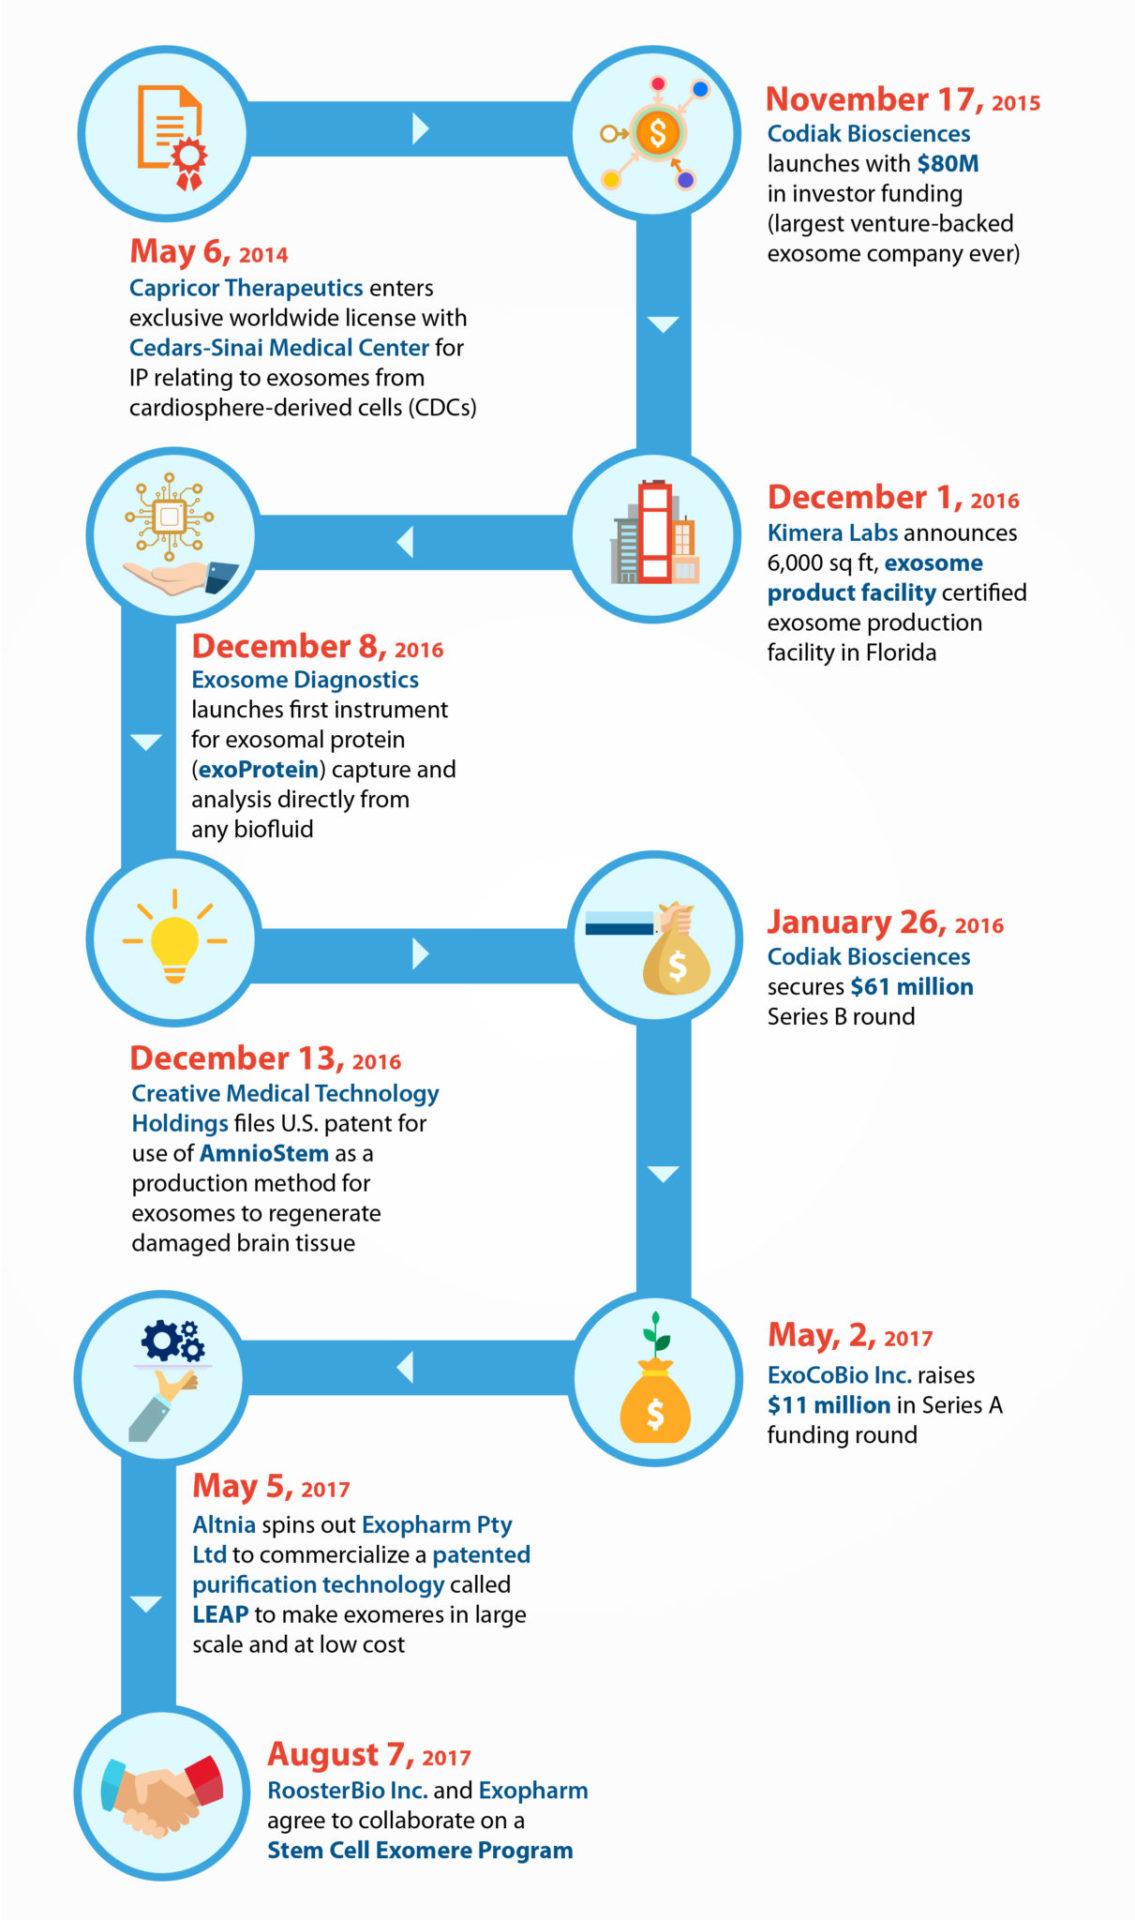 Exosome Industry Timeline